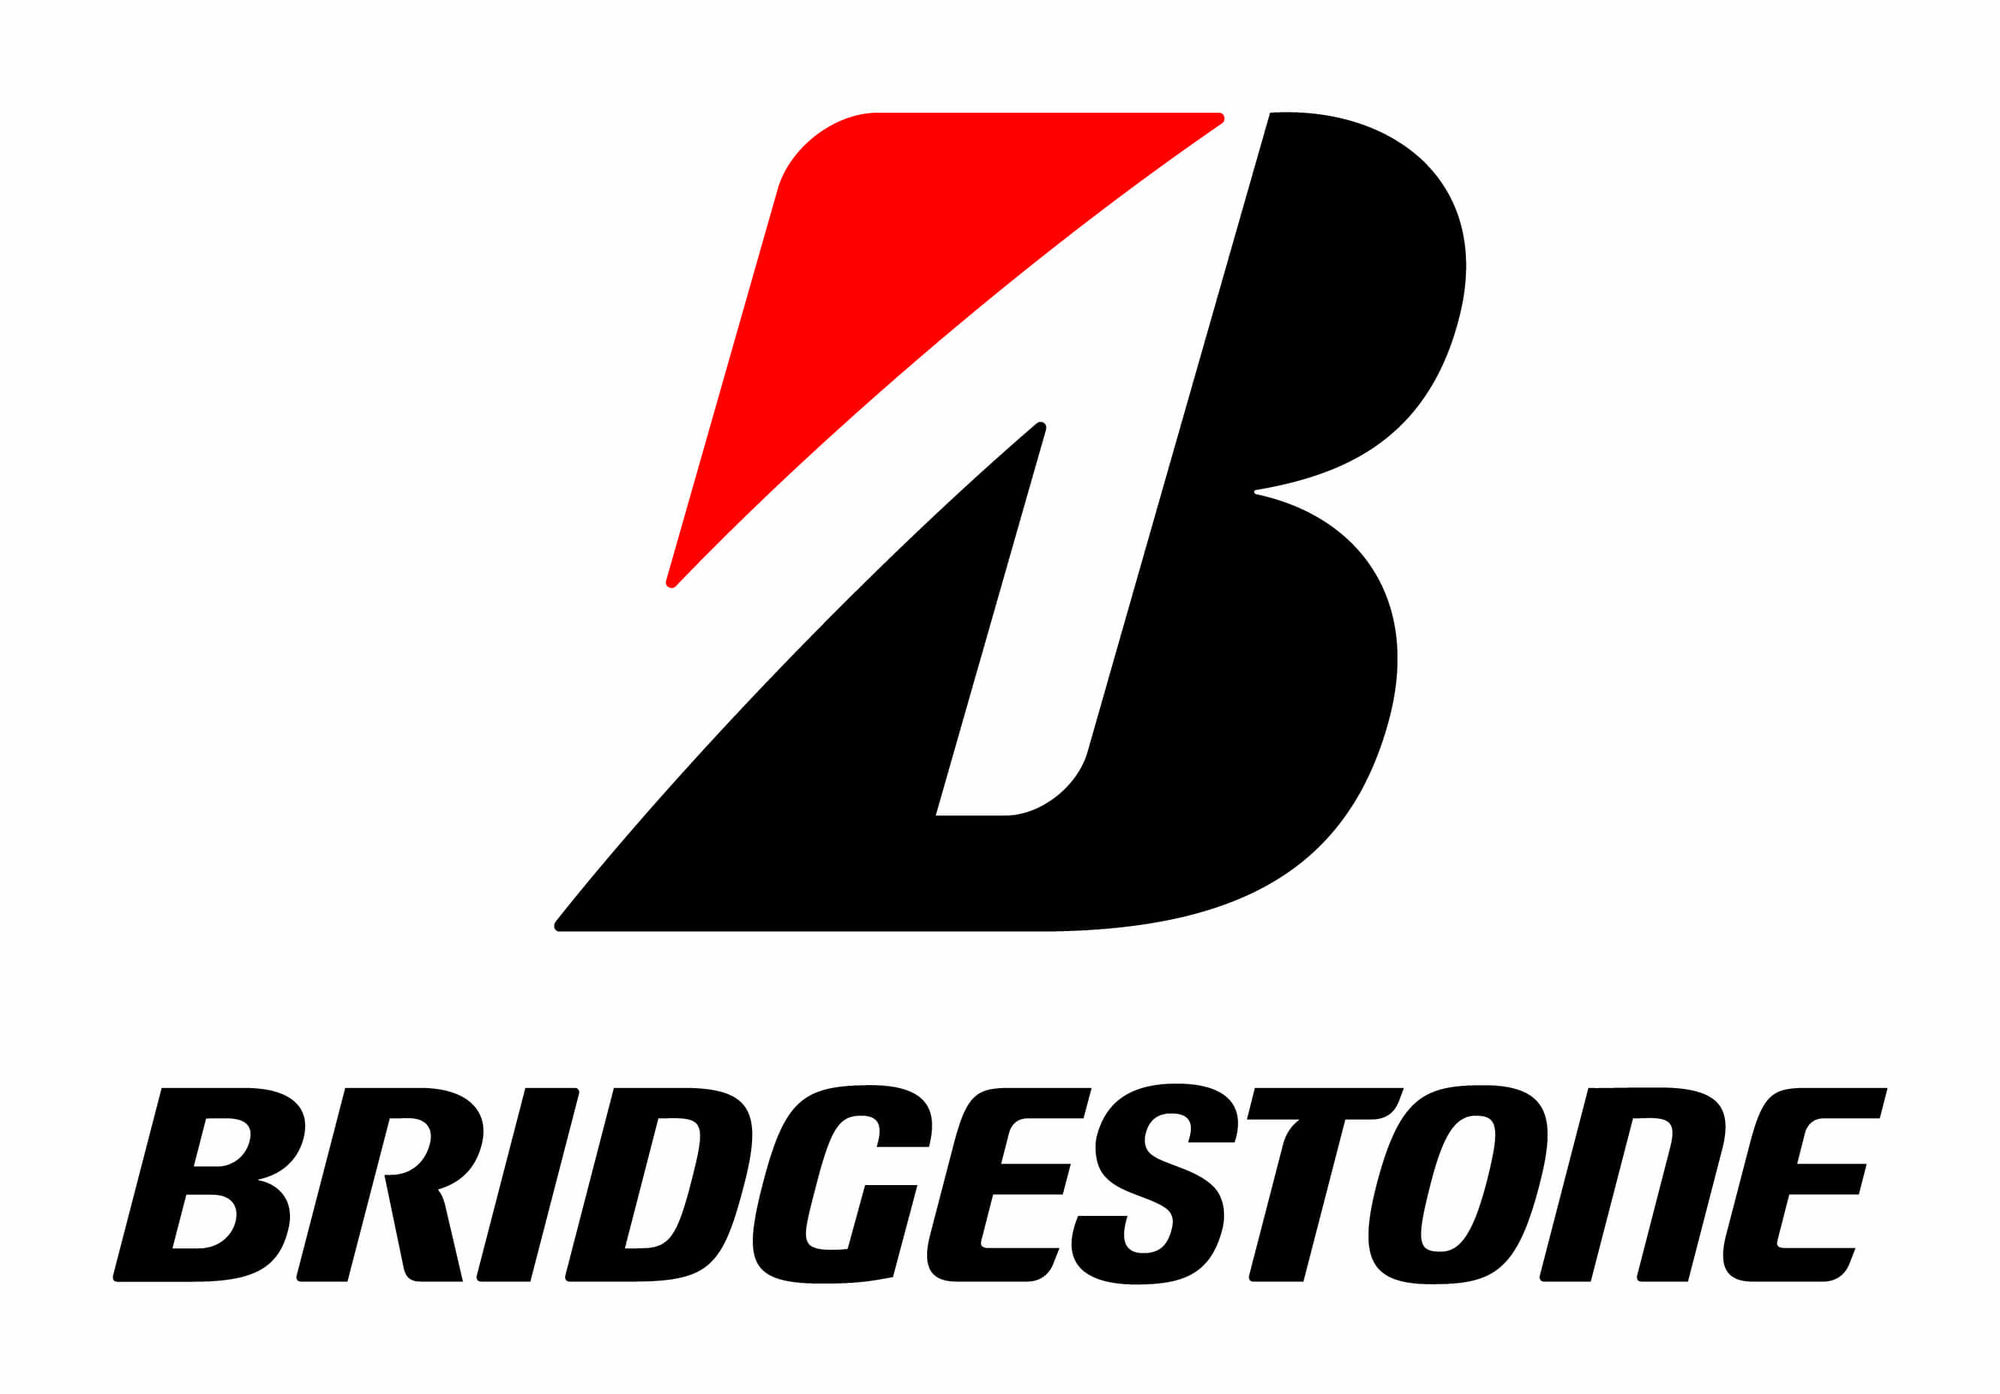 Logo Gumiabroncsok Bridgestone-logo